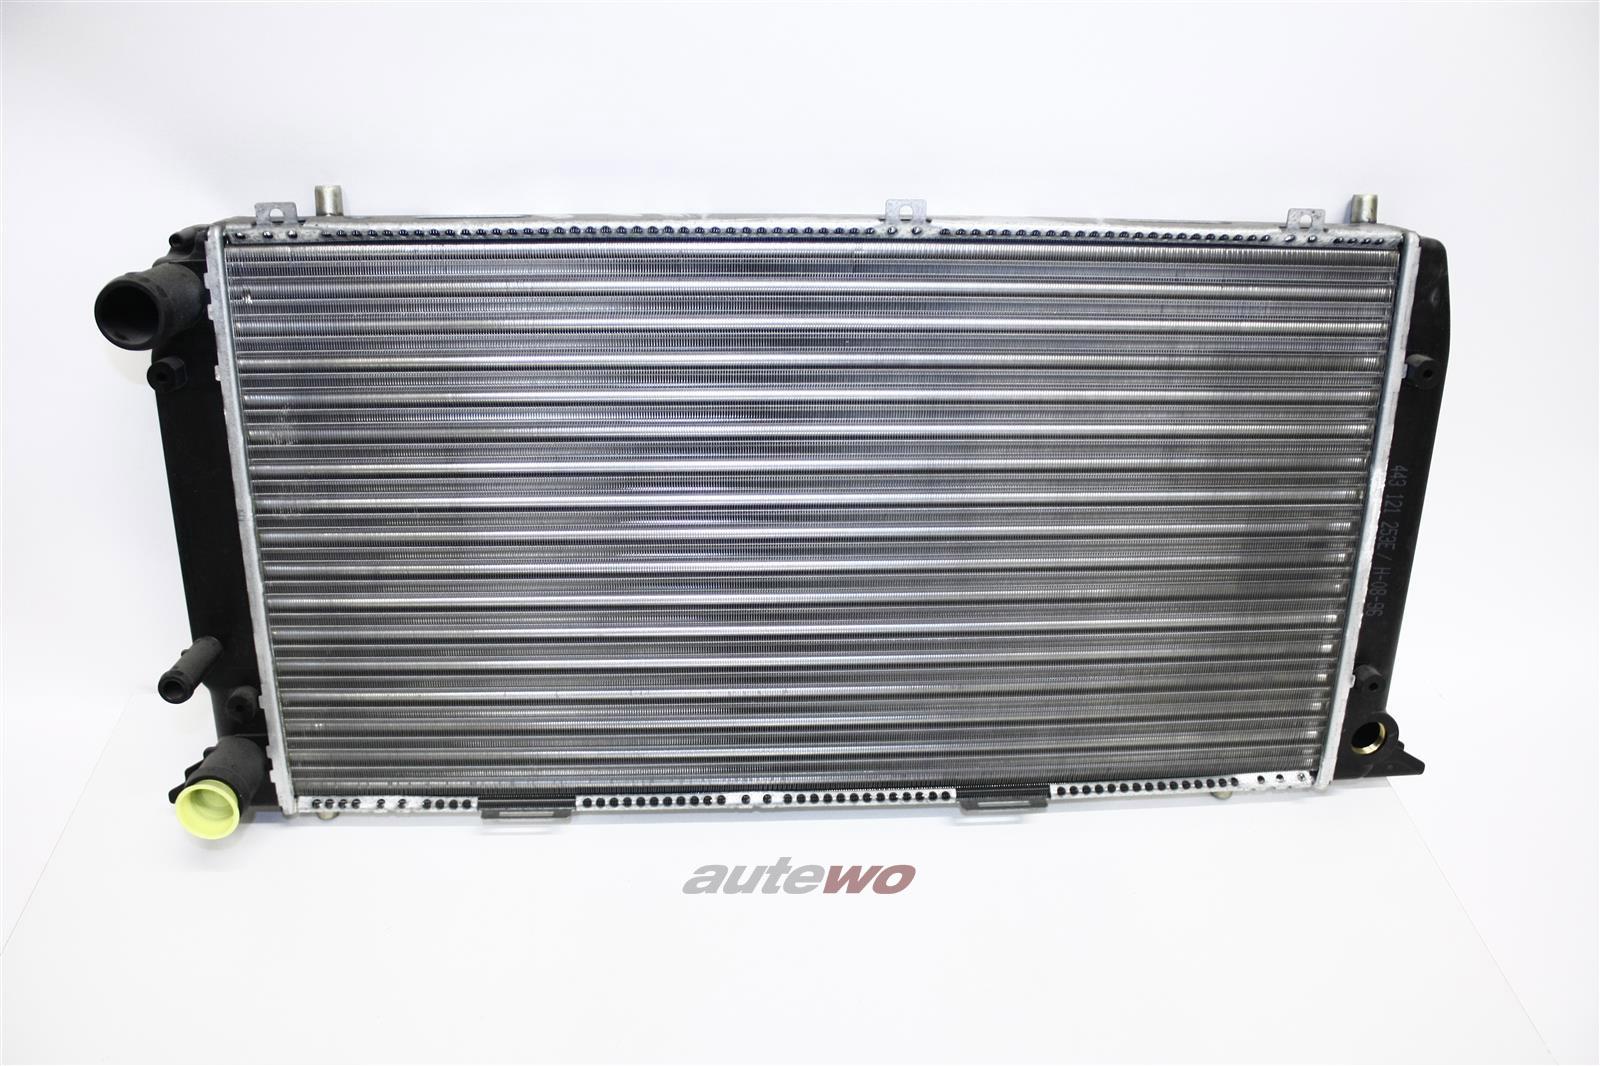 NEU&ORIGINAL Audi 100 Typ 44 4 Zyl. Wasserkühler 590mm 443121253E